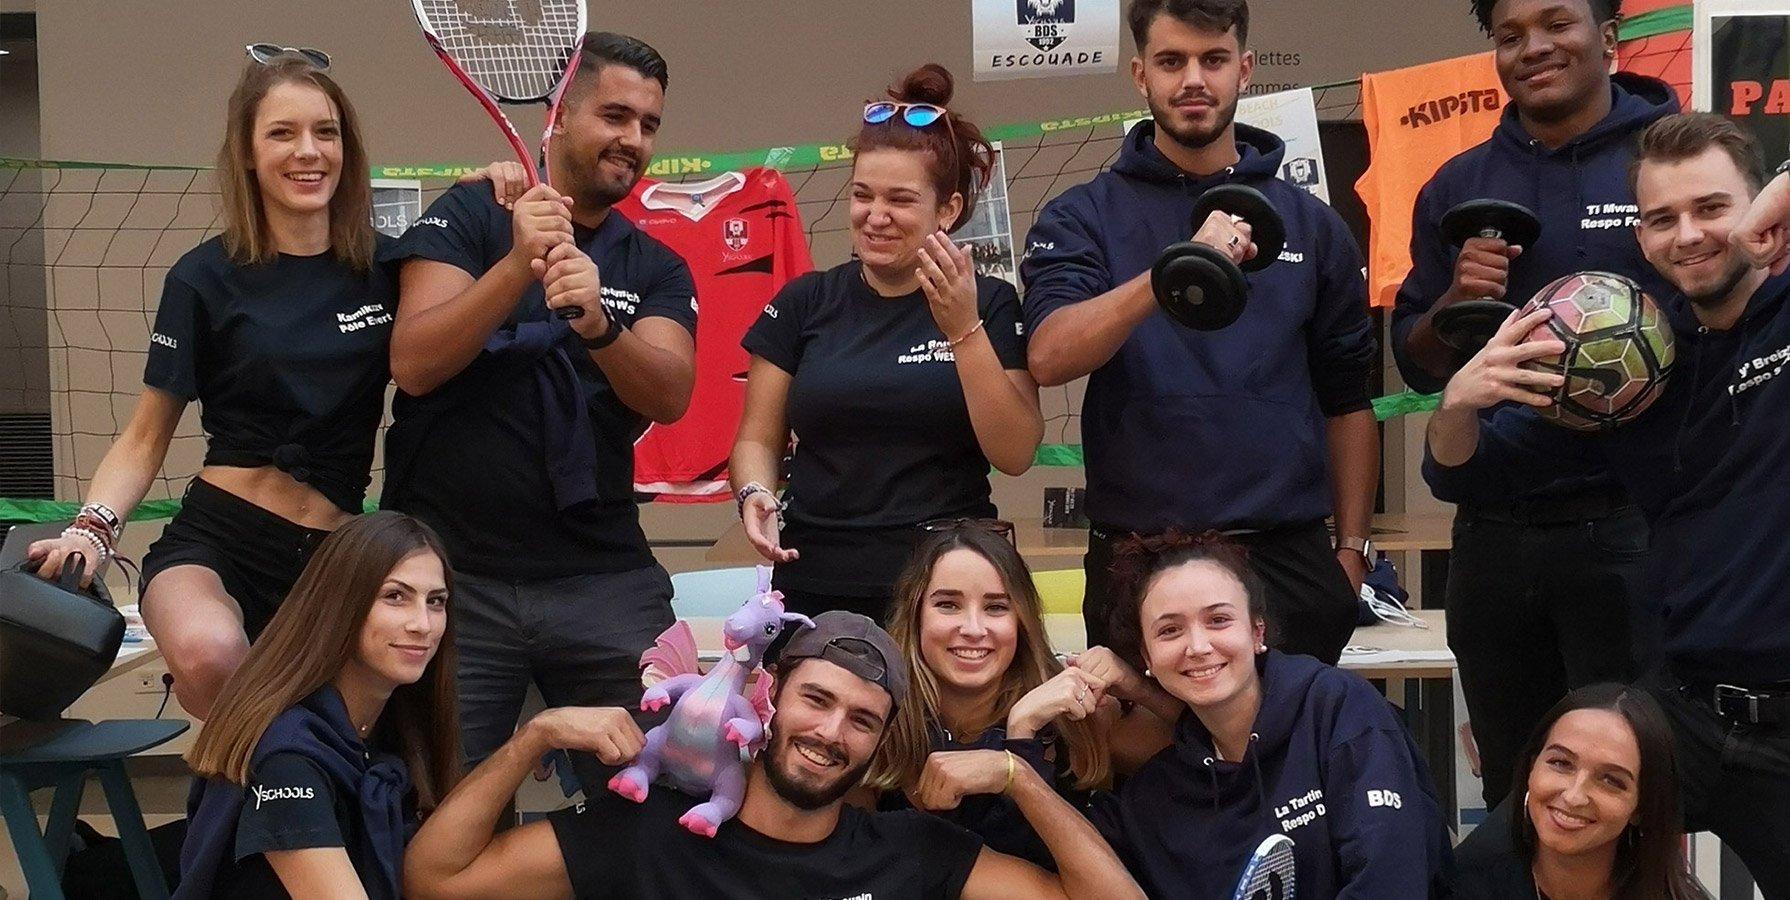 scbs-vis-associative-projet-programme-sportif-etudiants